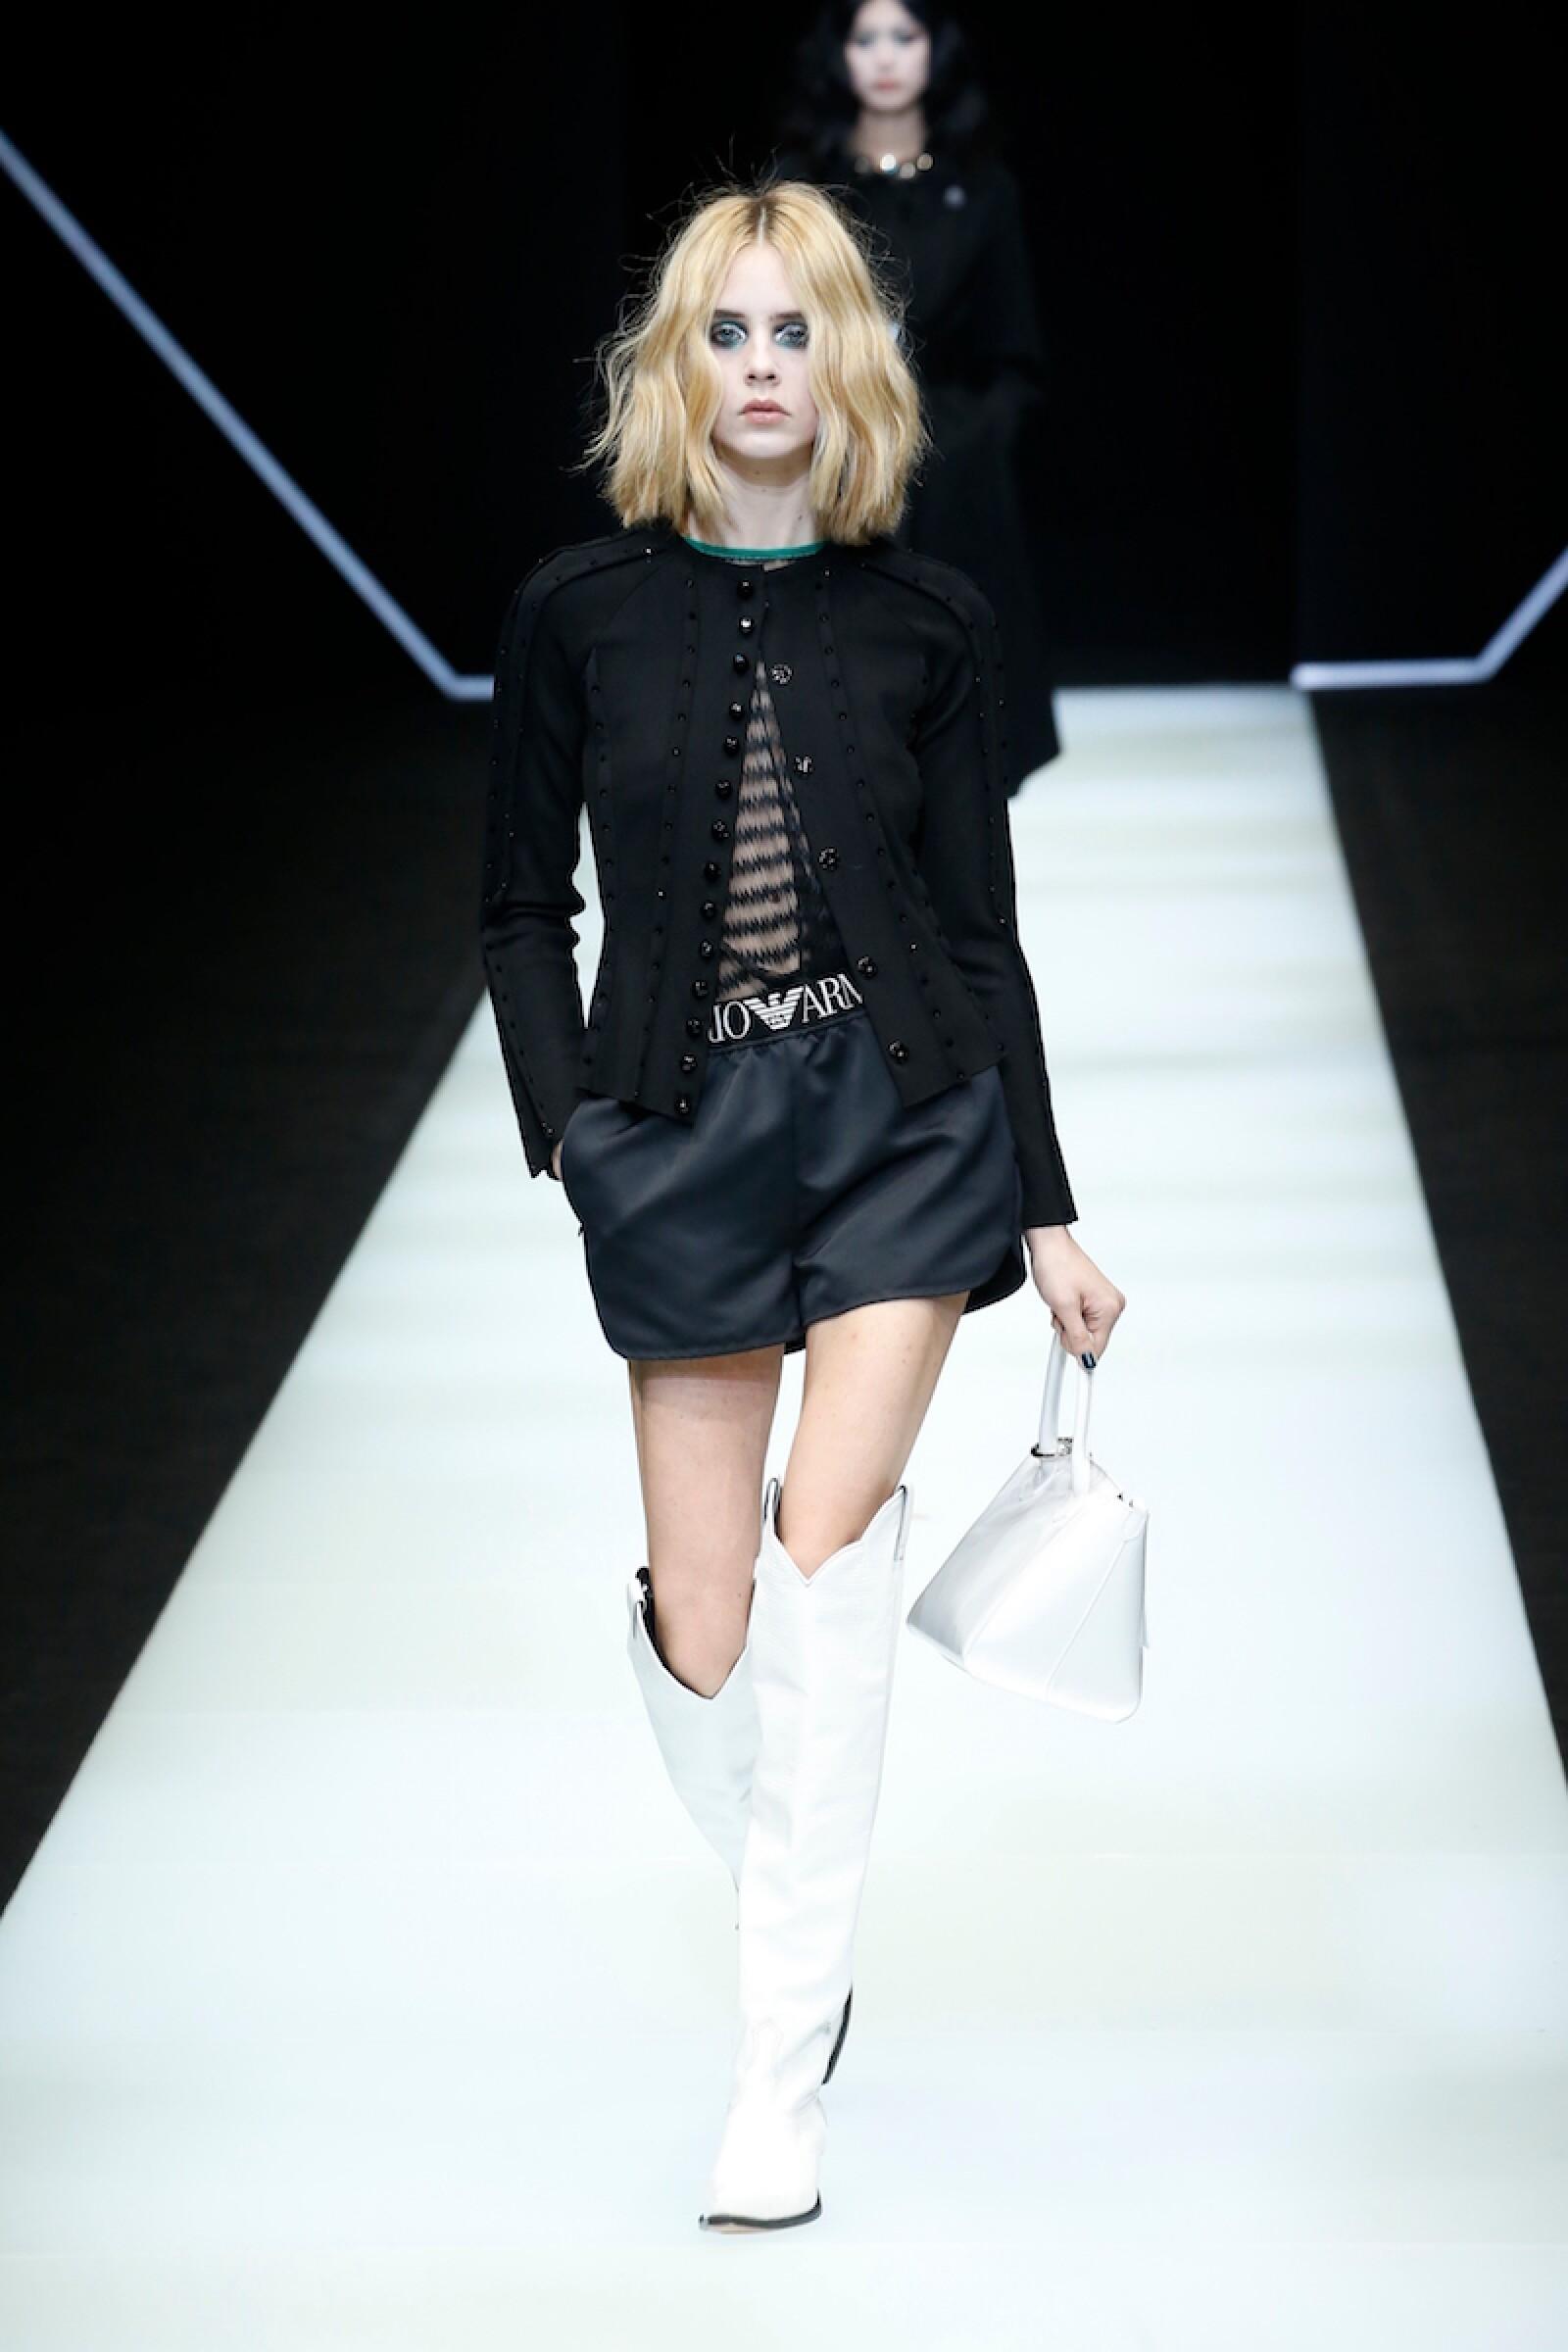 Emporio Armani show, Runway, Fall Winter 2018, Milan Fashion Week, Italy - 25 Feb 2018